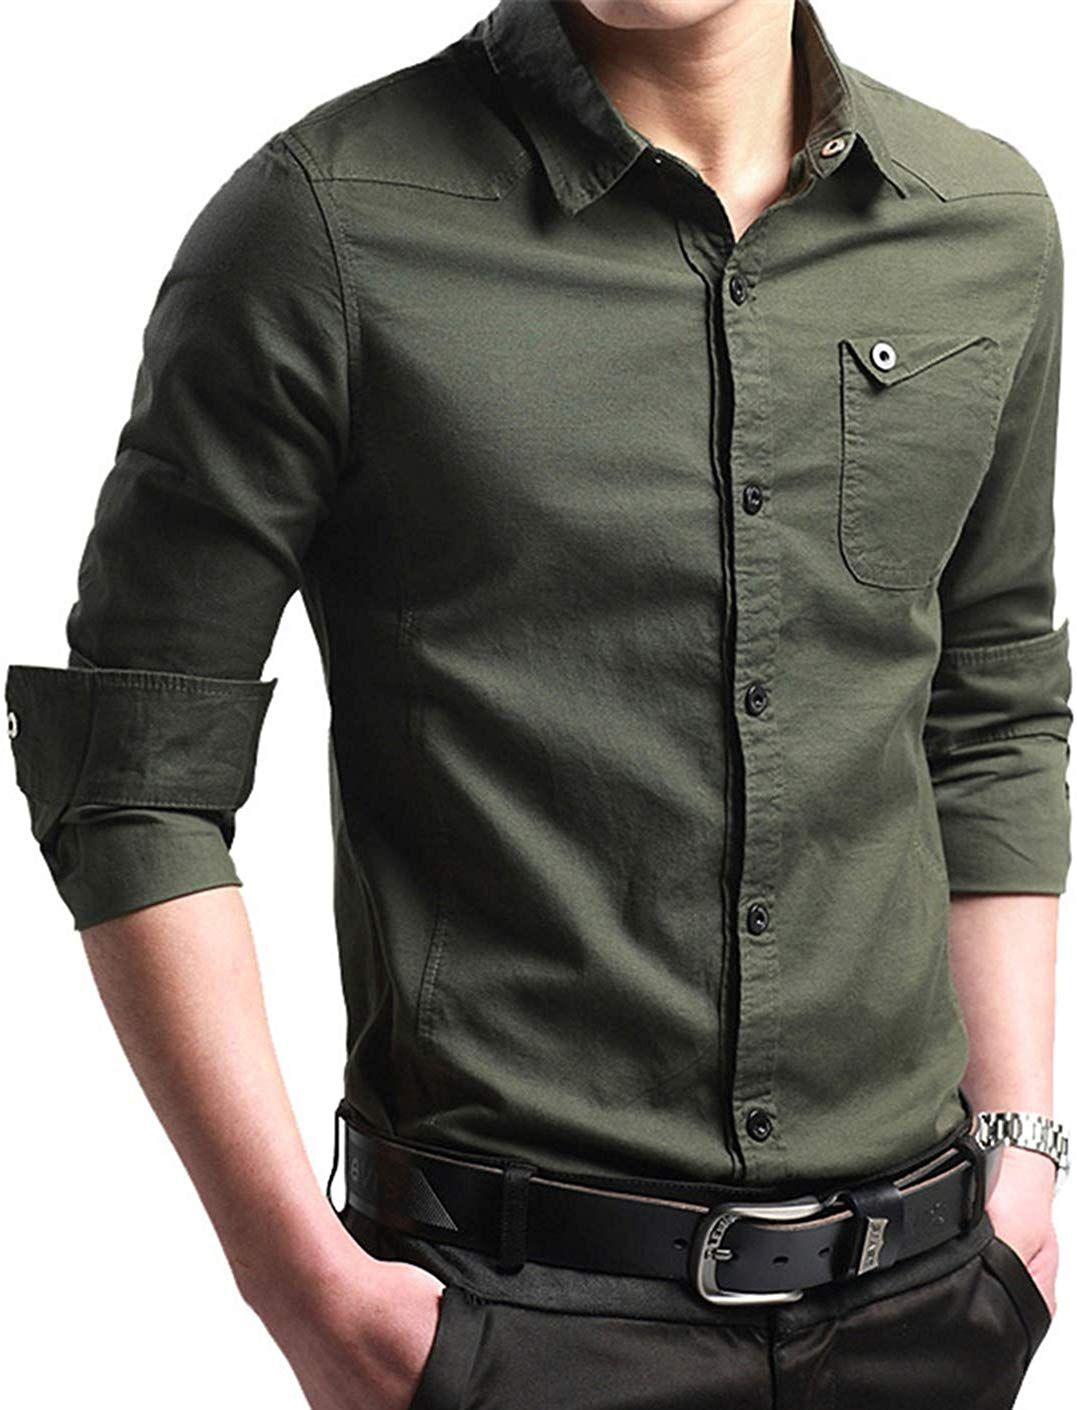 Xtapan Men S Casual Slim Fit Shirt Cotton Long Sleeve Button Down Dress Shirt Price 24 99 Mens Shirts Men Casual Slim Fit Shirt [ 1410 x 1077 Pixel ]